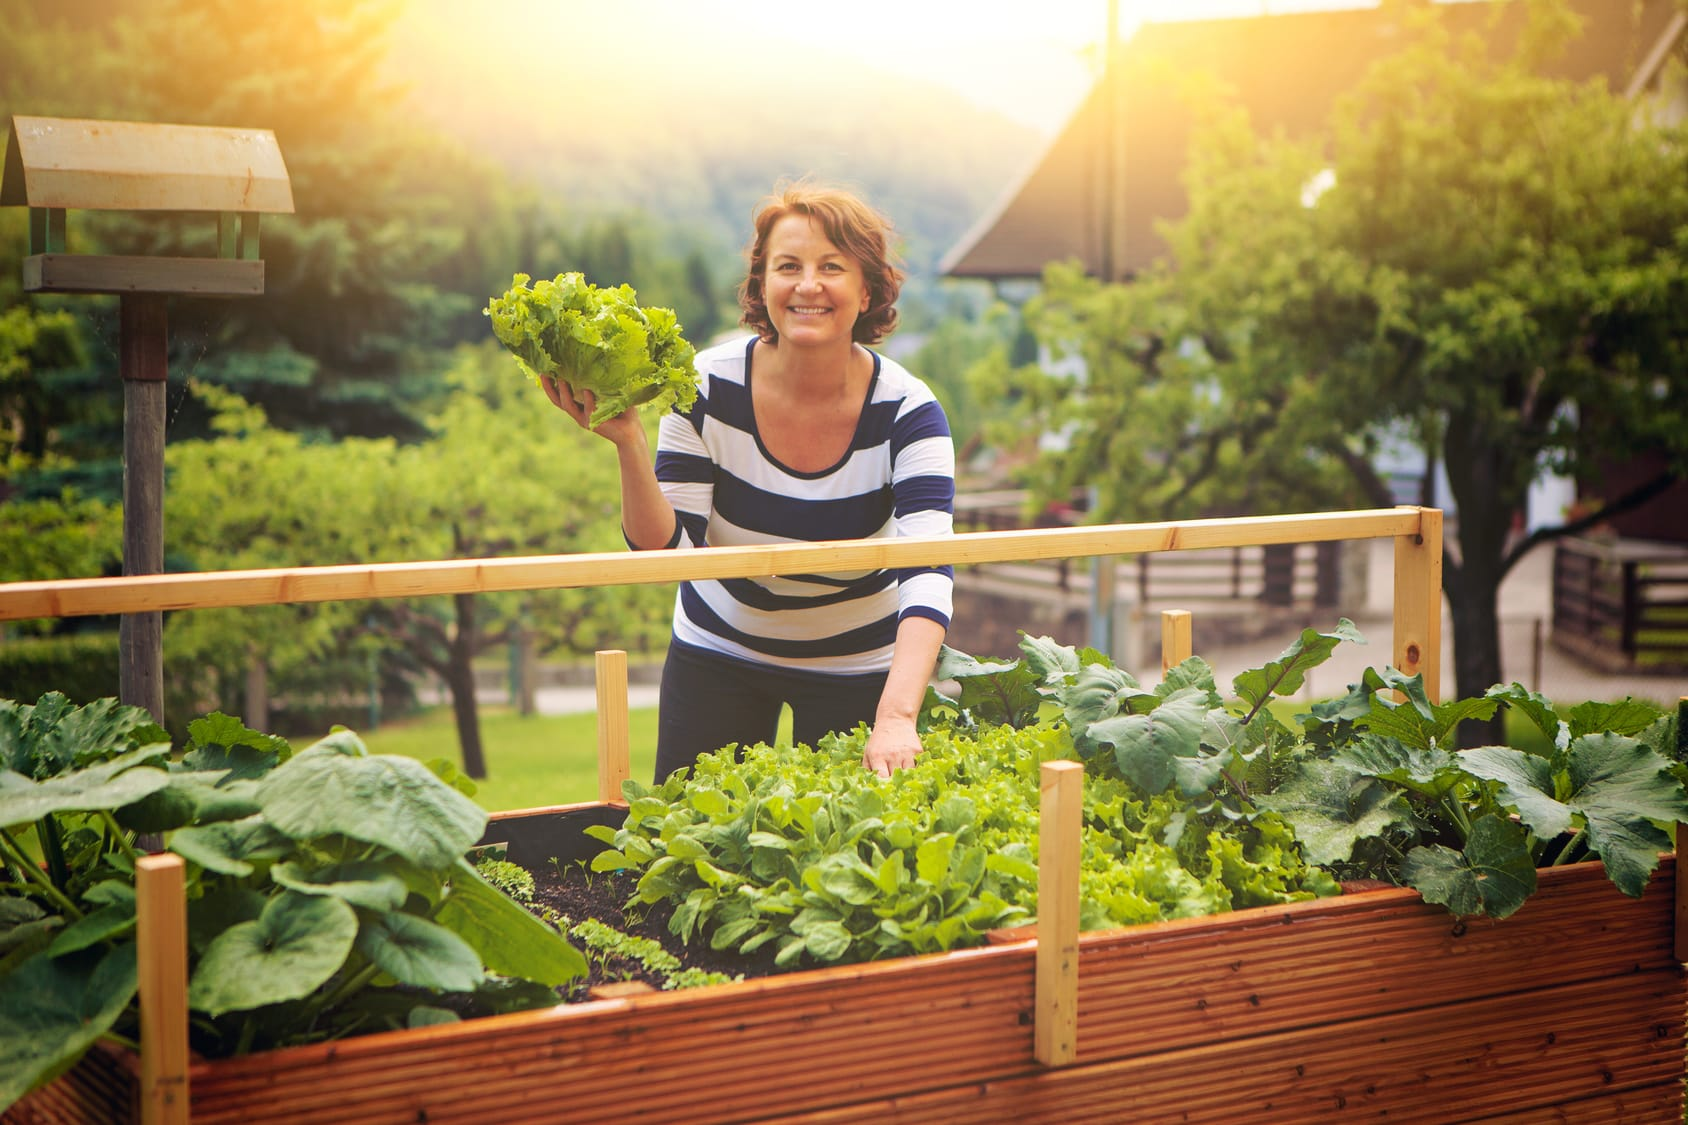 Salat ernten – Morgens oder abends?